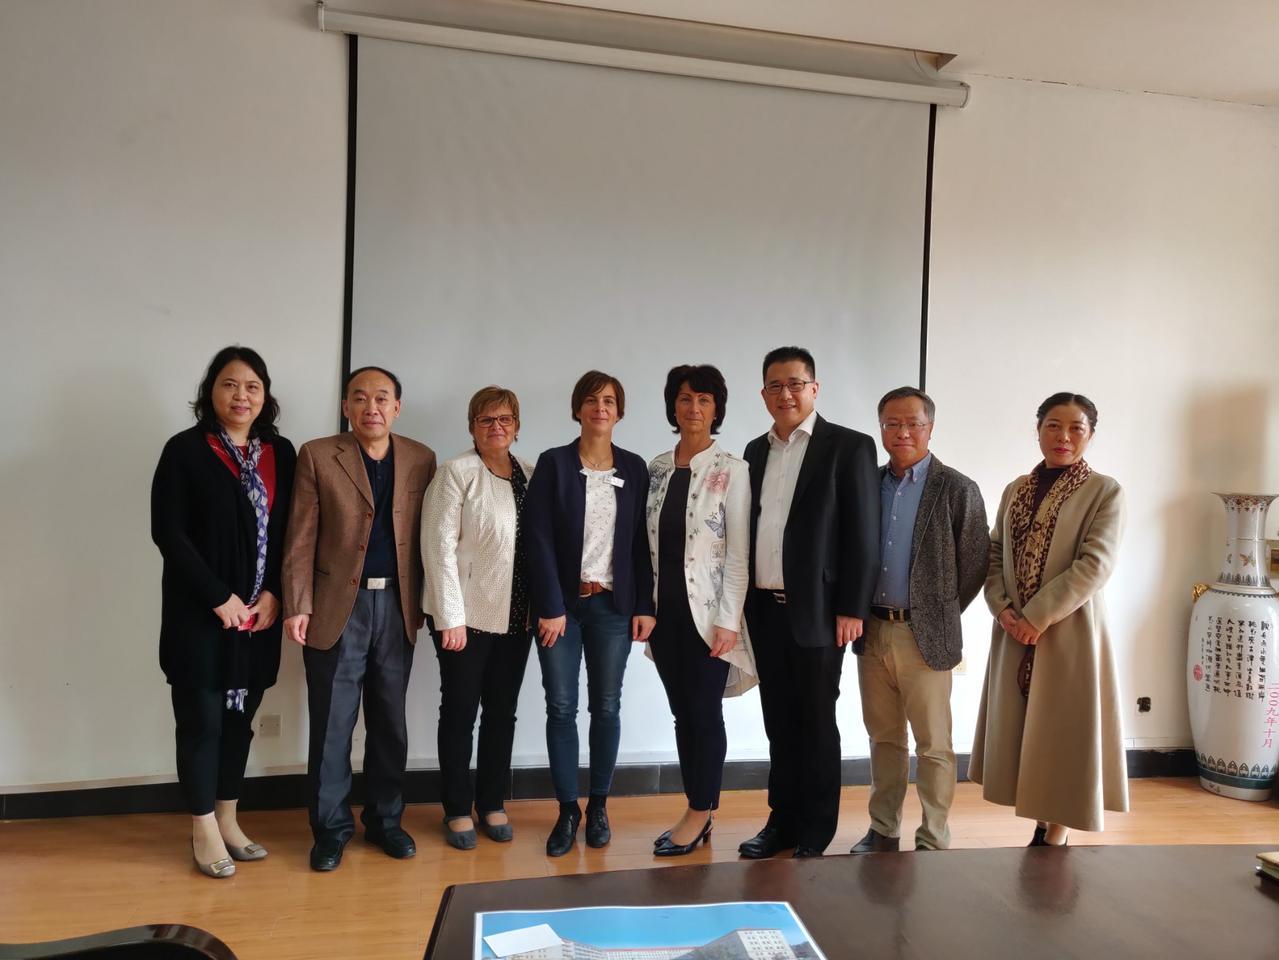 Xingyu Tao aus Goslar berichtet über Wuhan